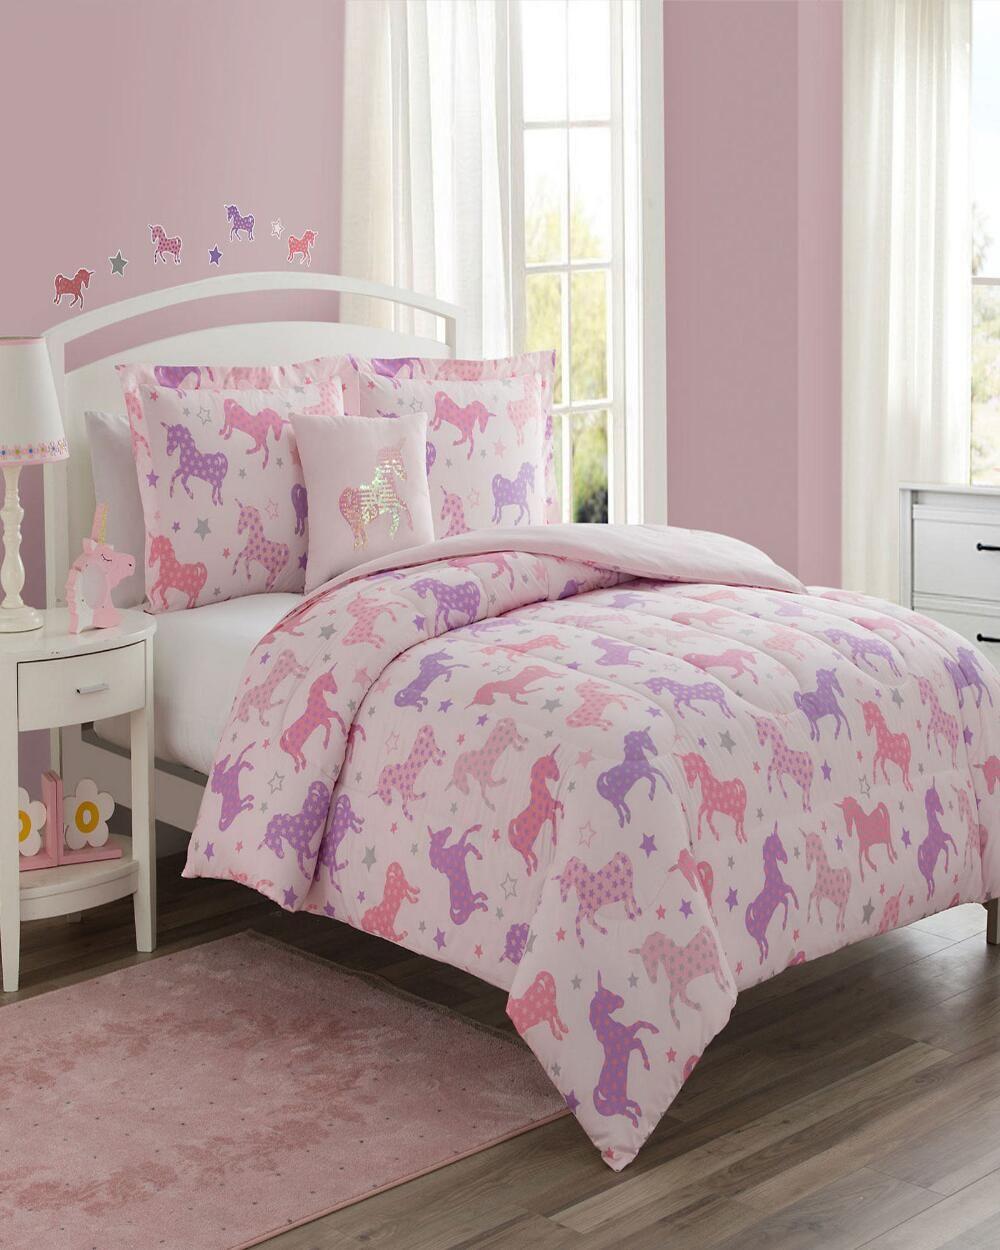 4 Piece Unicorn Starlight Comforter Set In 2020 Comforter Sets